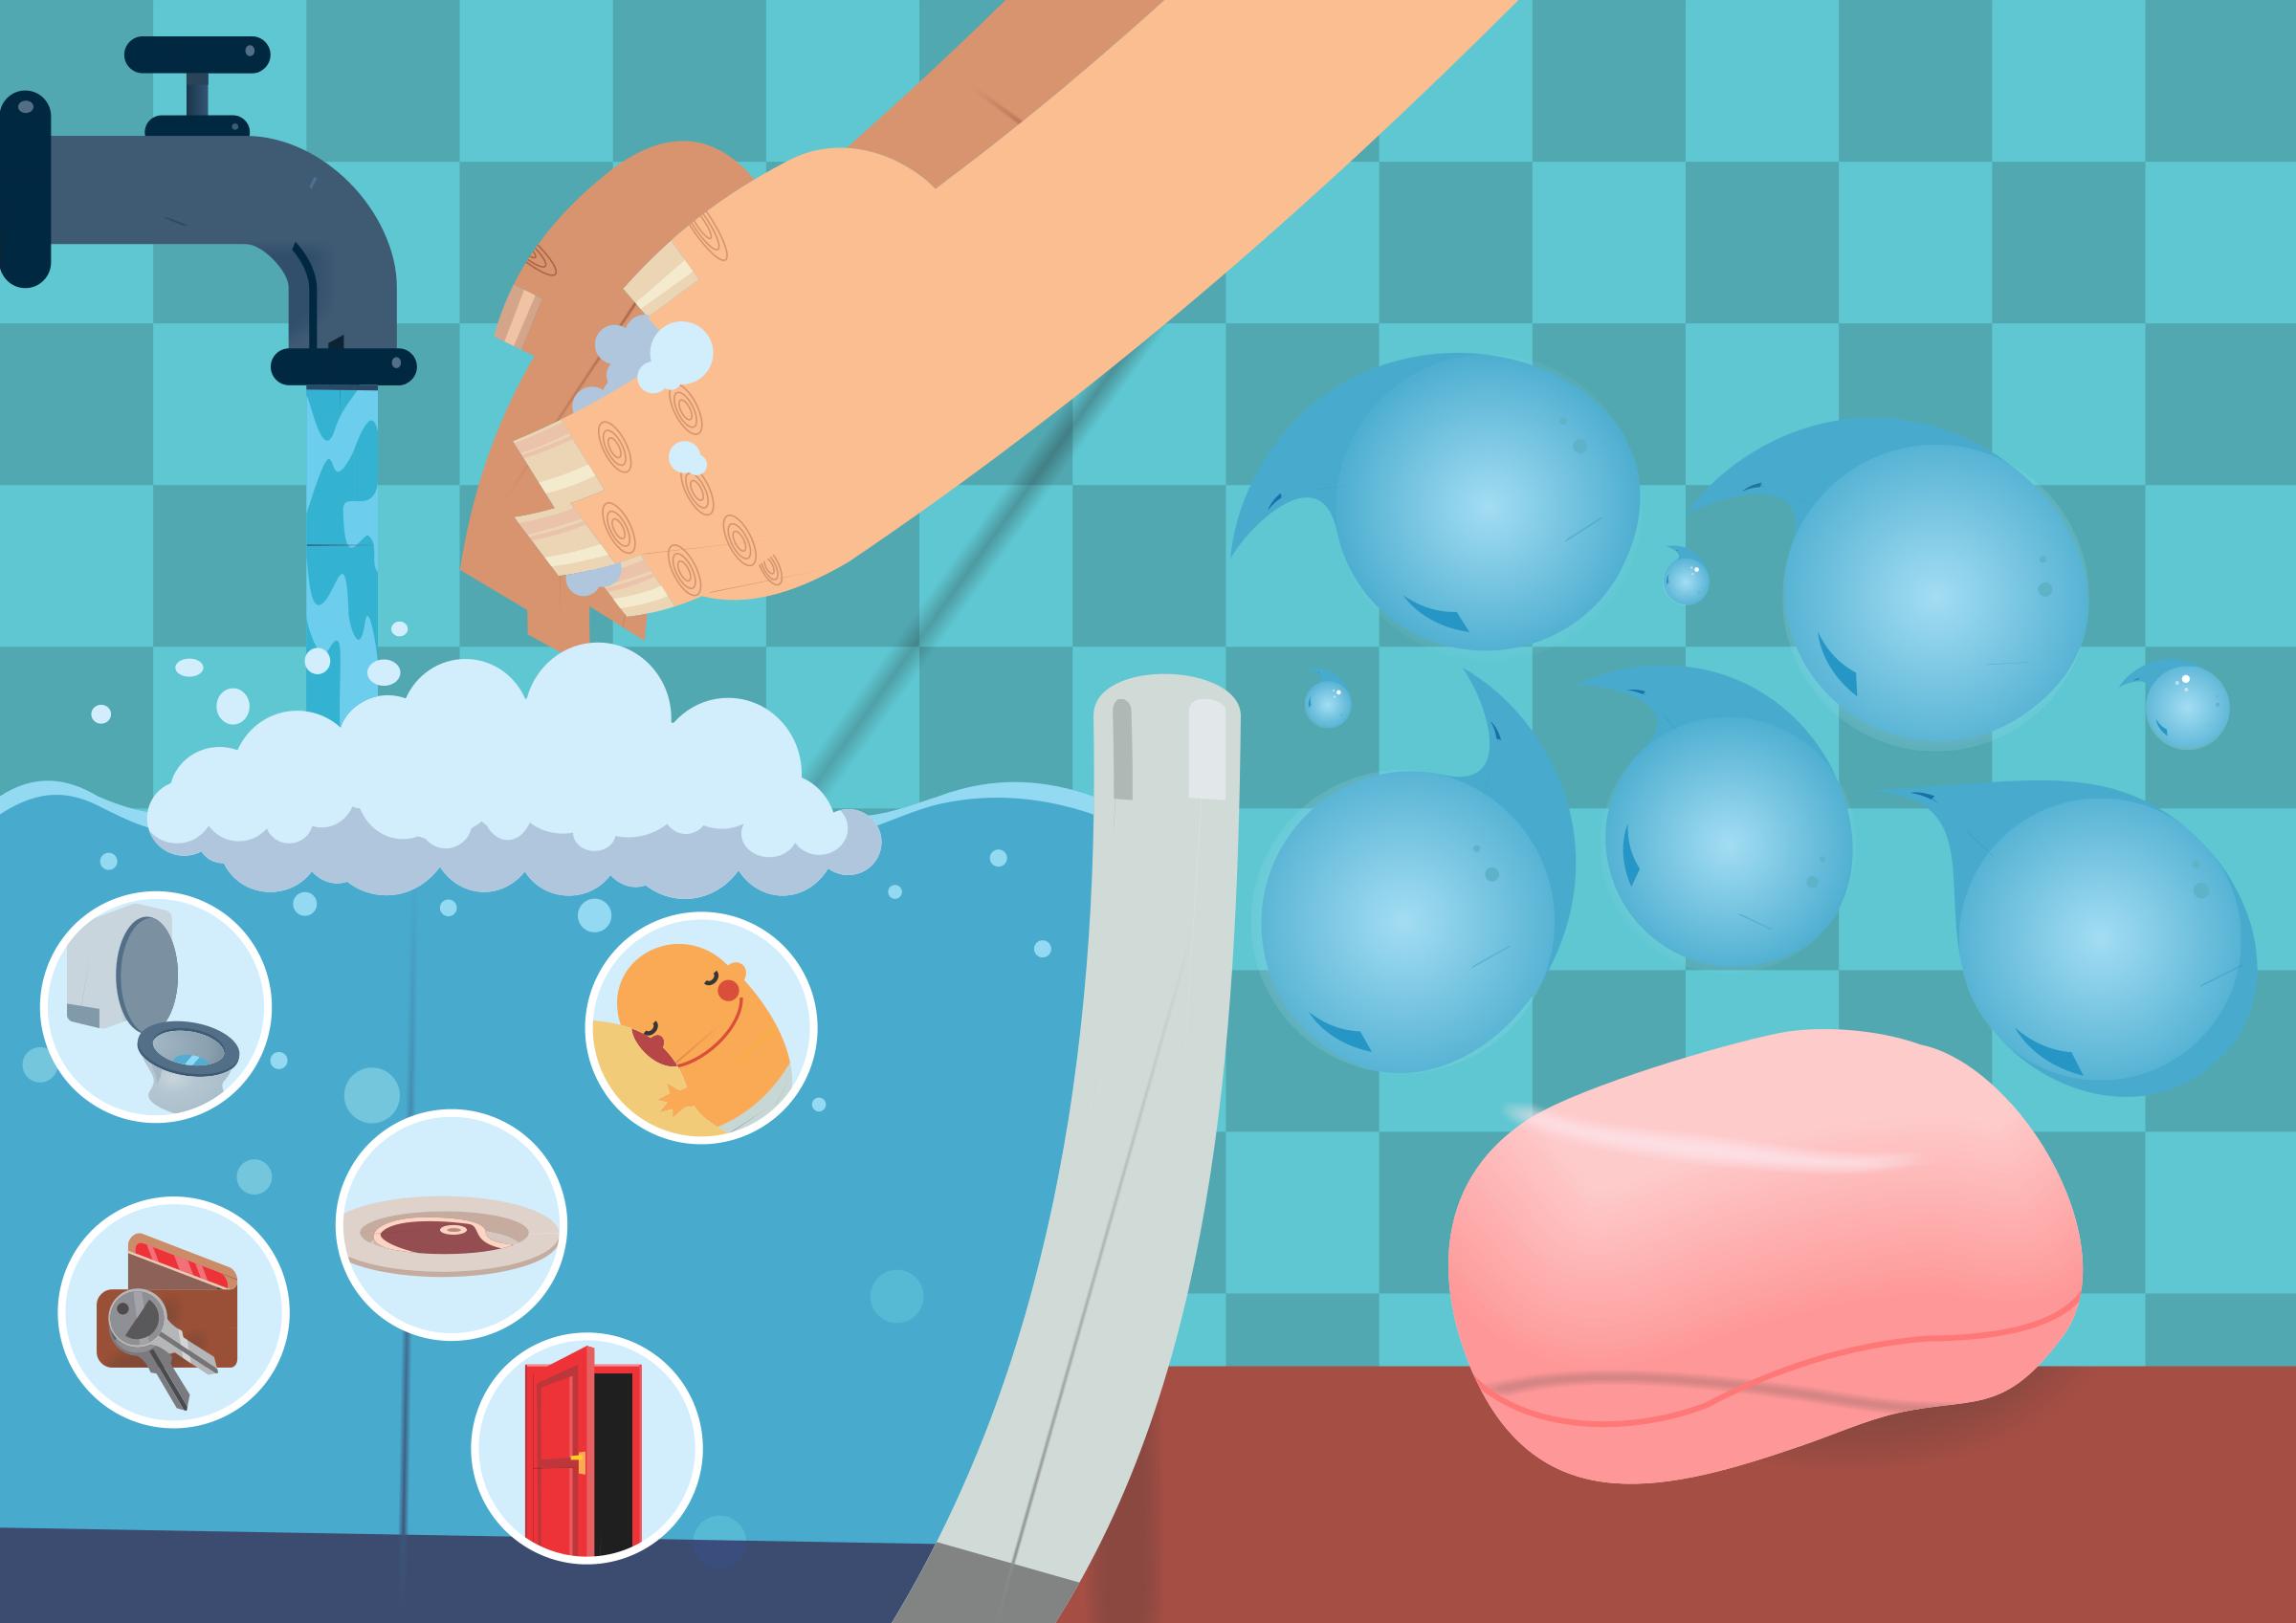 Lavabo de manos ideas de disenos for Lavabo de manos